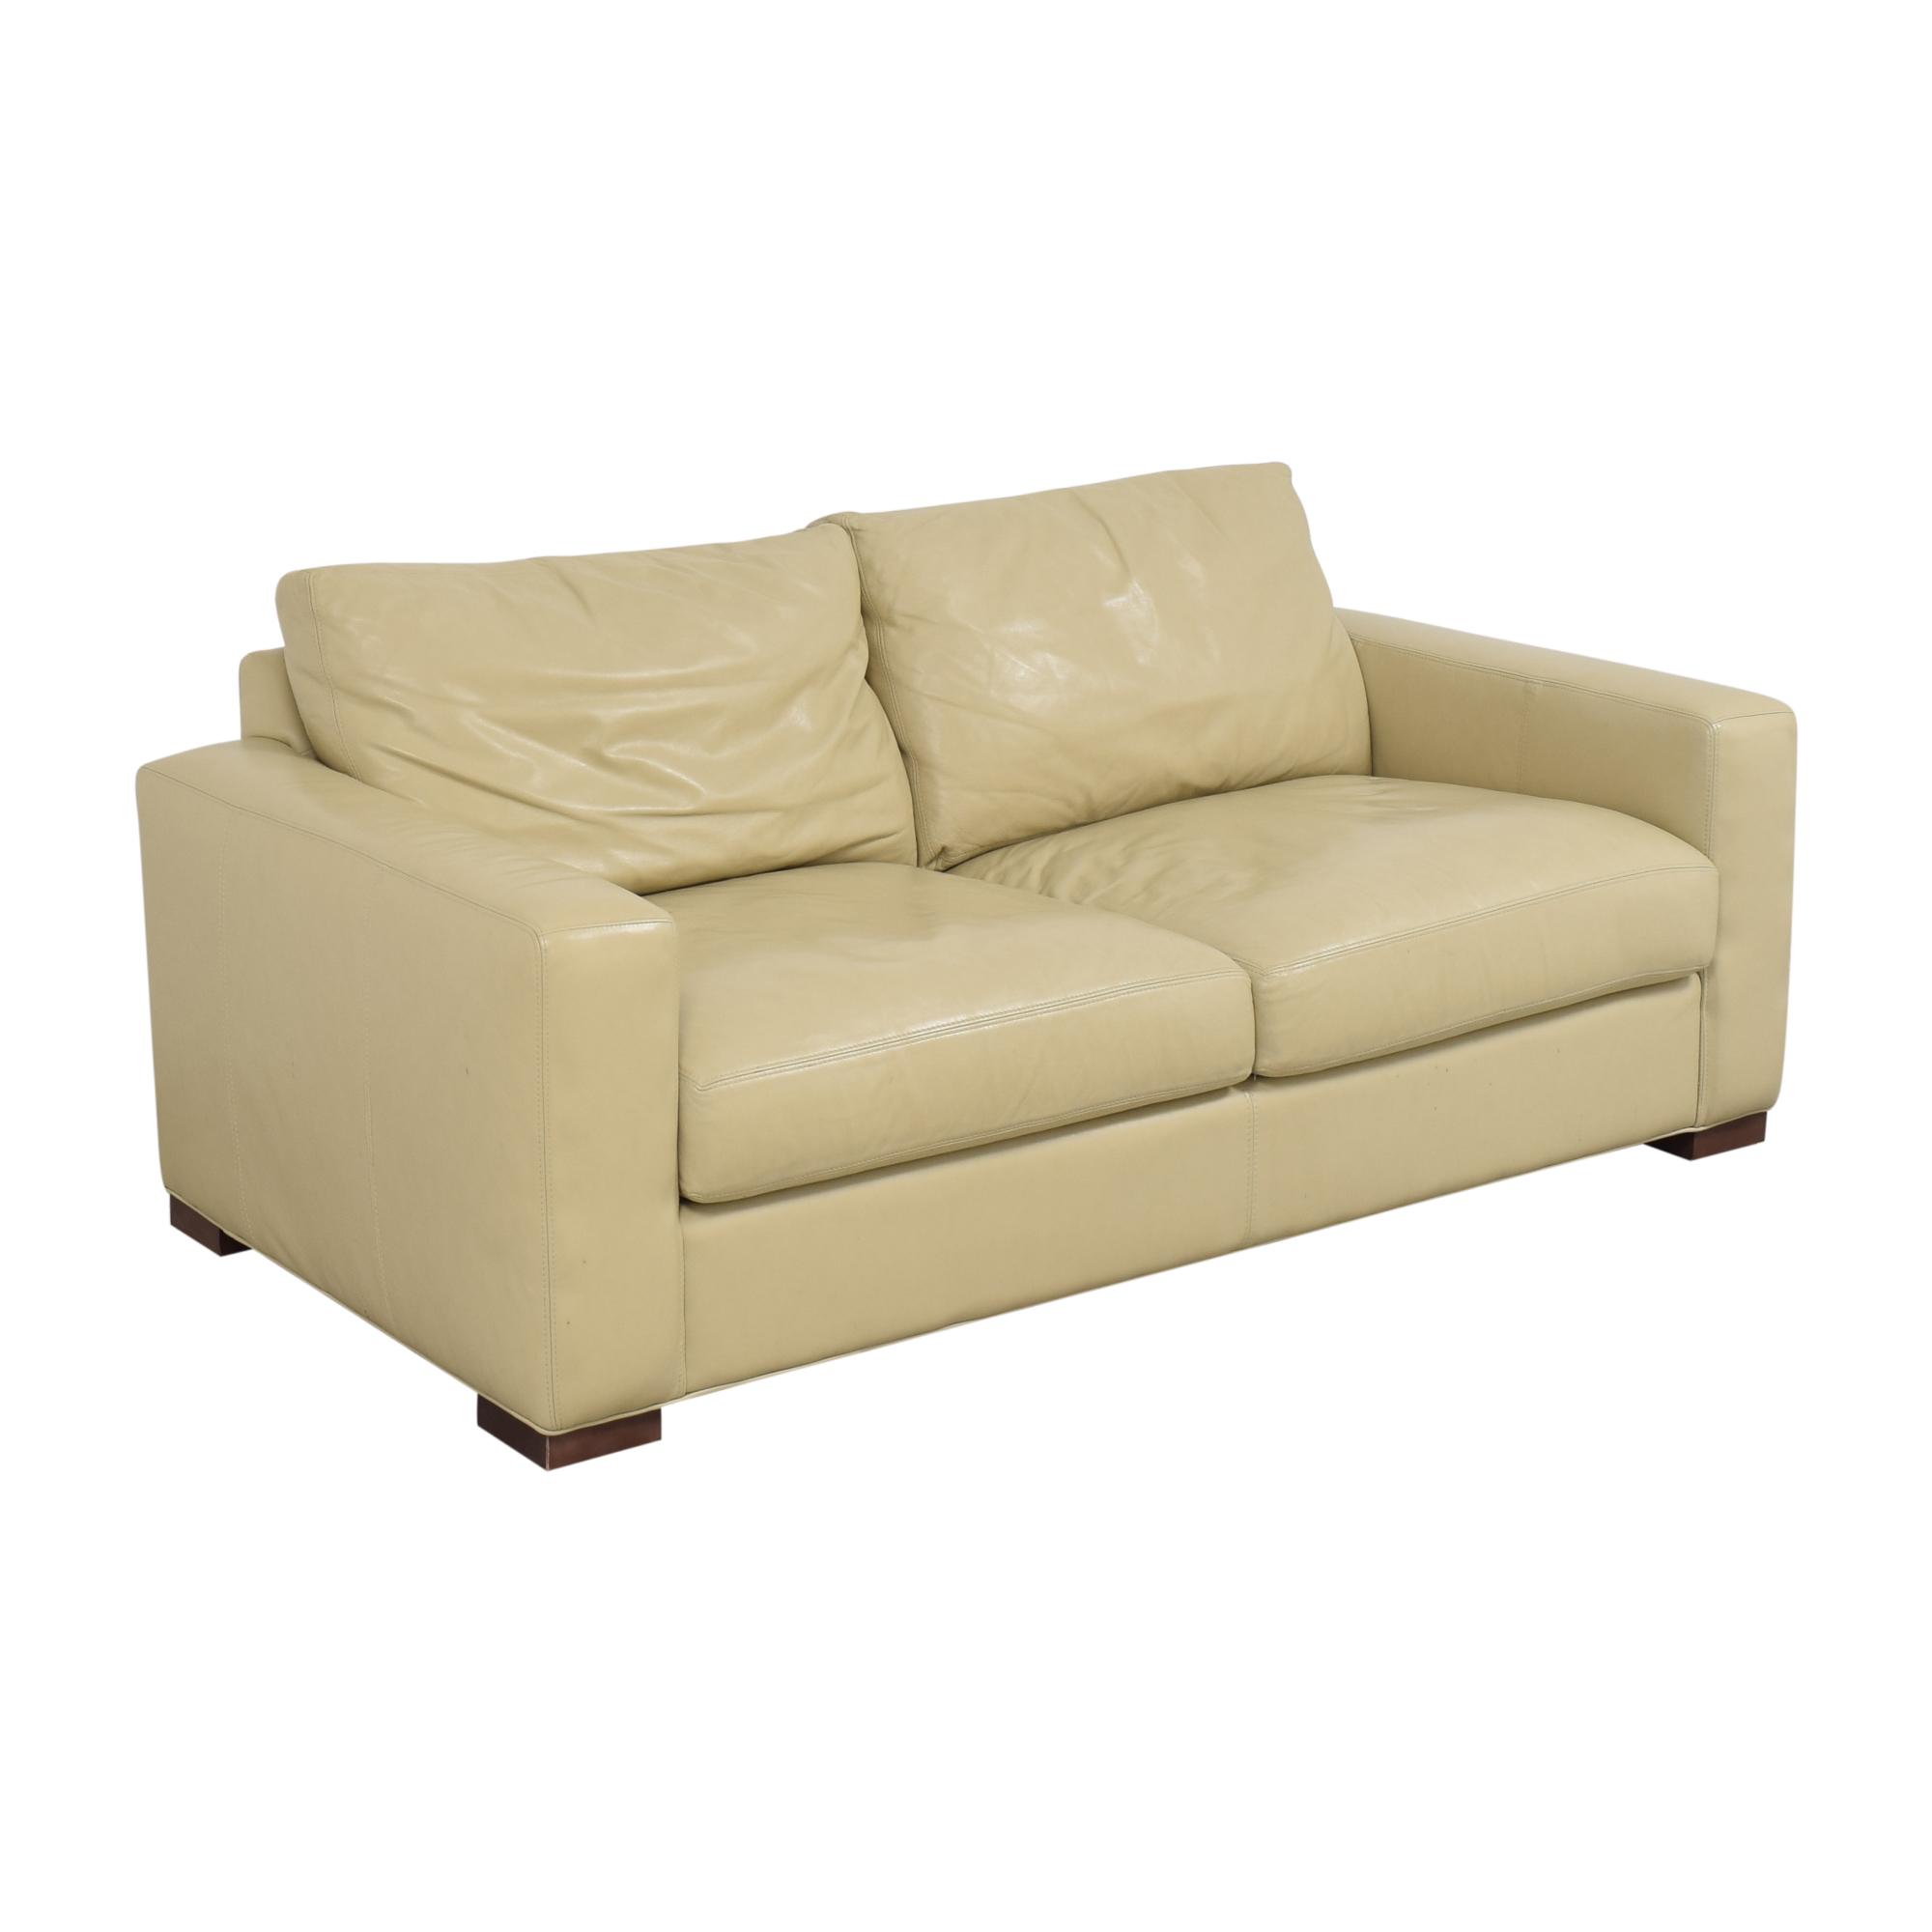 Room & Board Two Cushion Sofa / Sofas